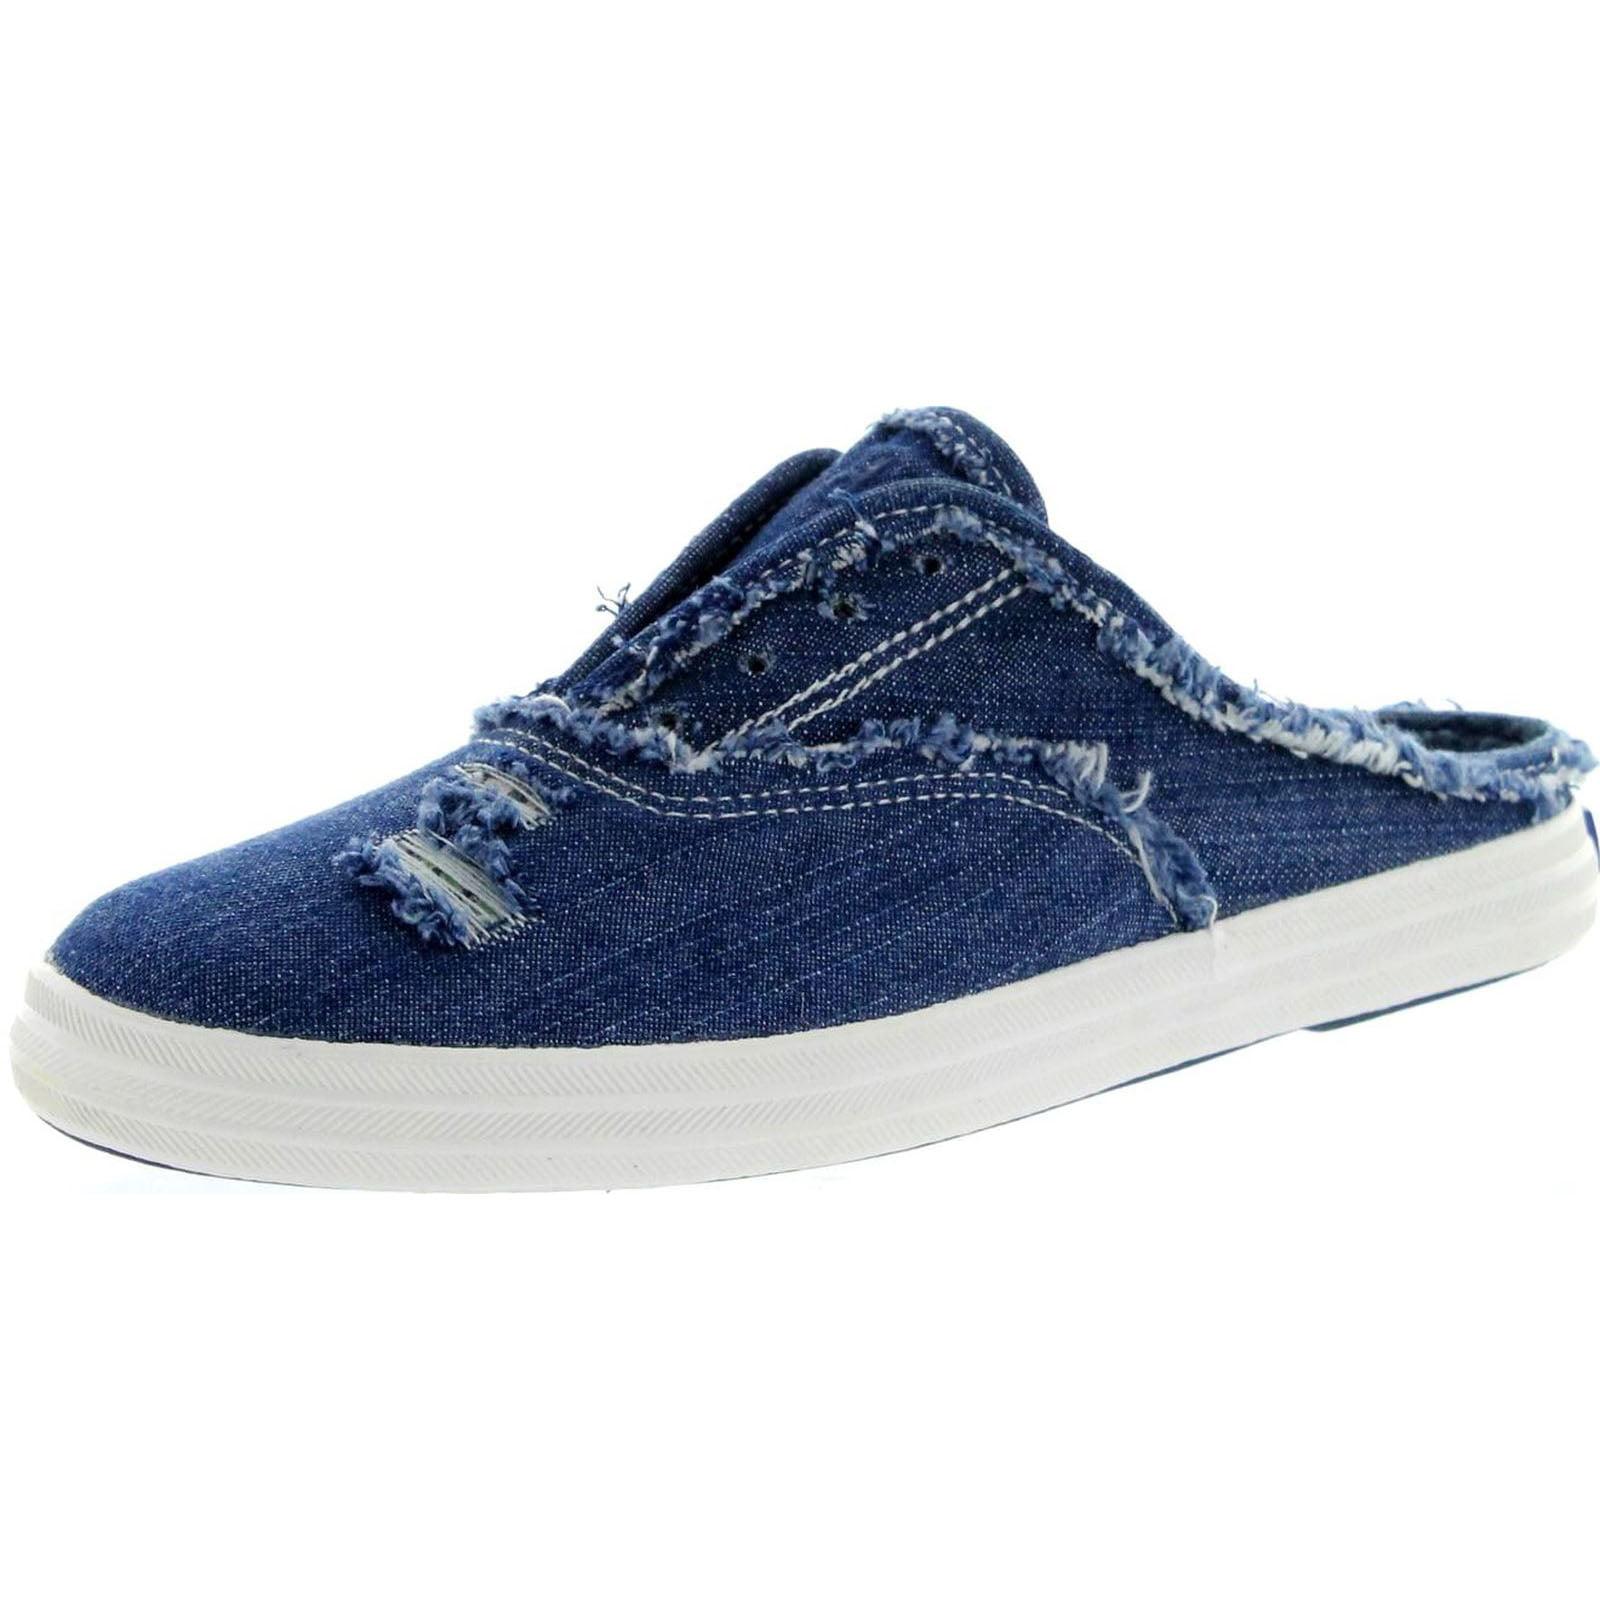 Keds Girls Champion Slip On Open Back Shoes by Keds